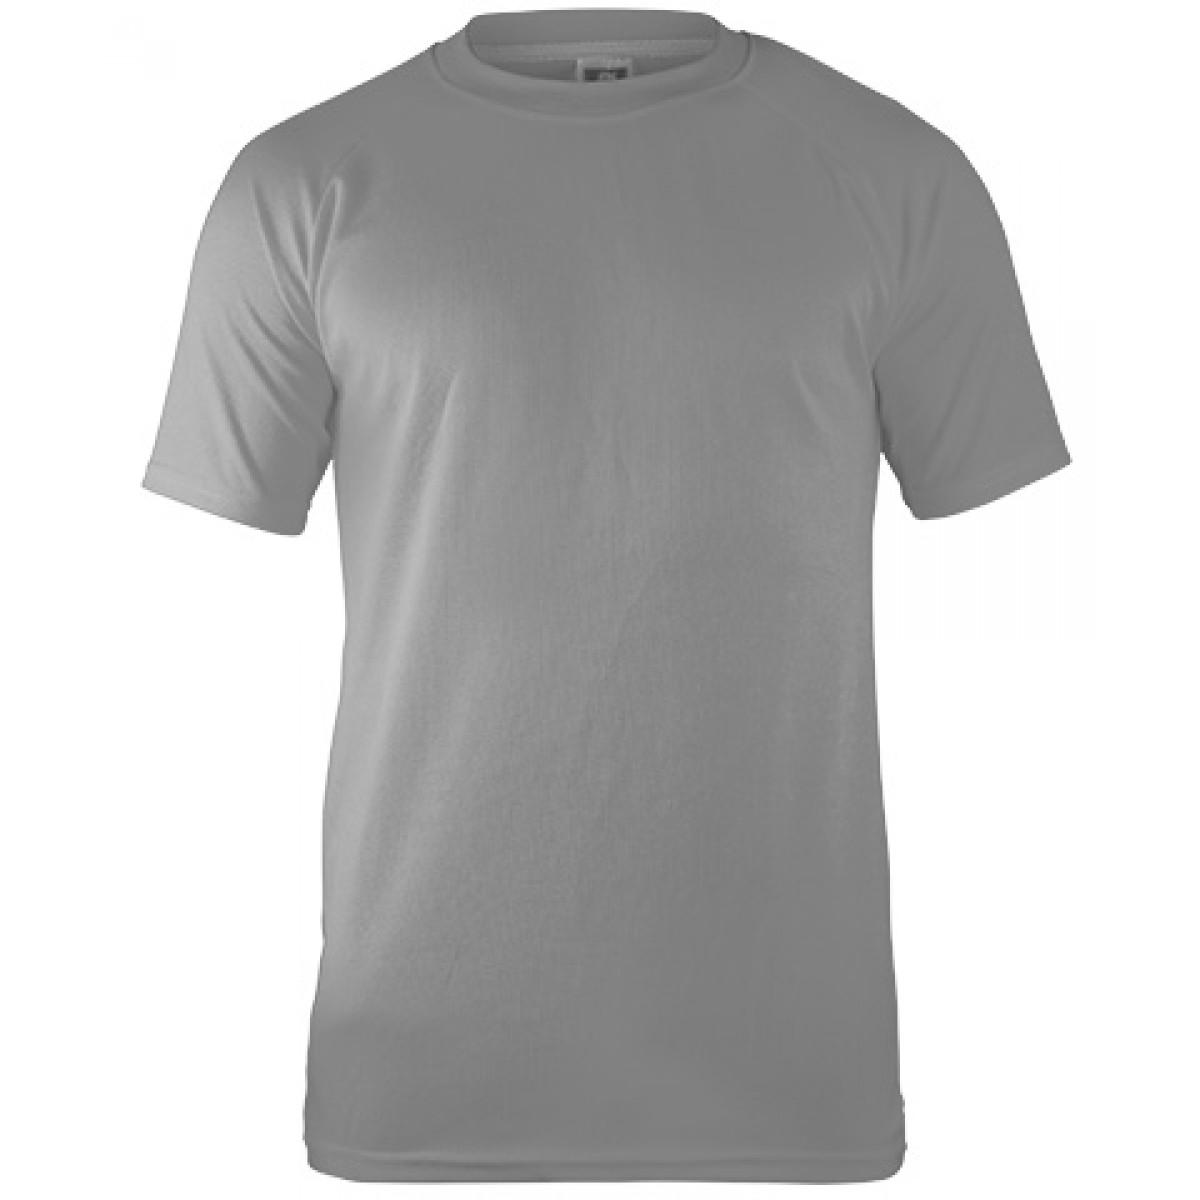 Performance T-shirt-Gray -YL